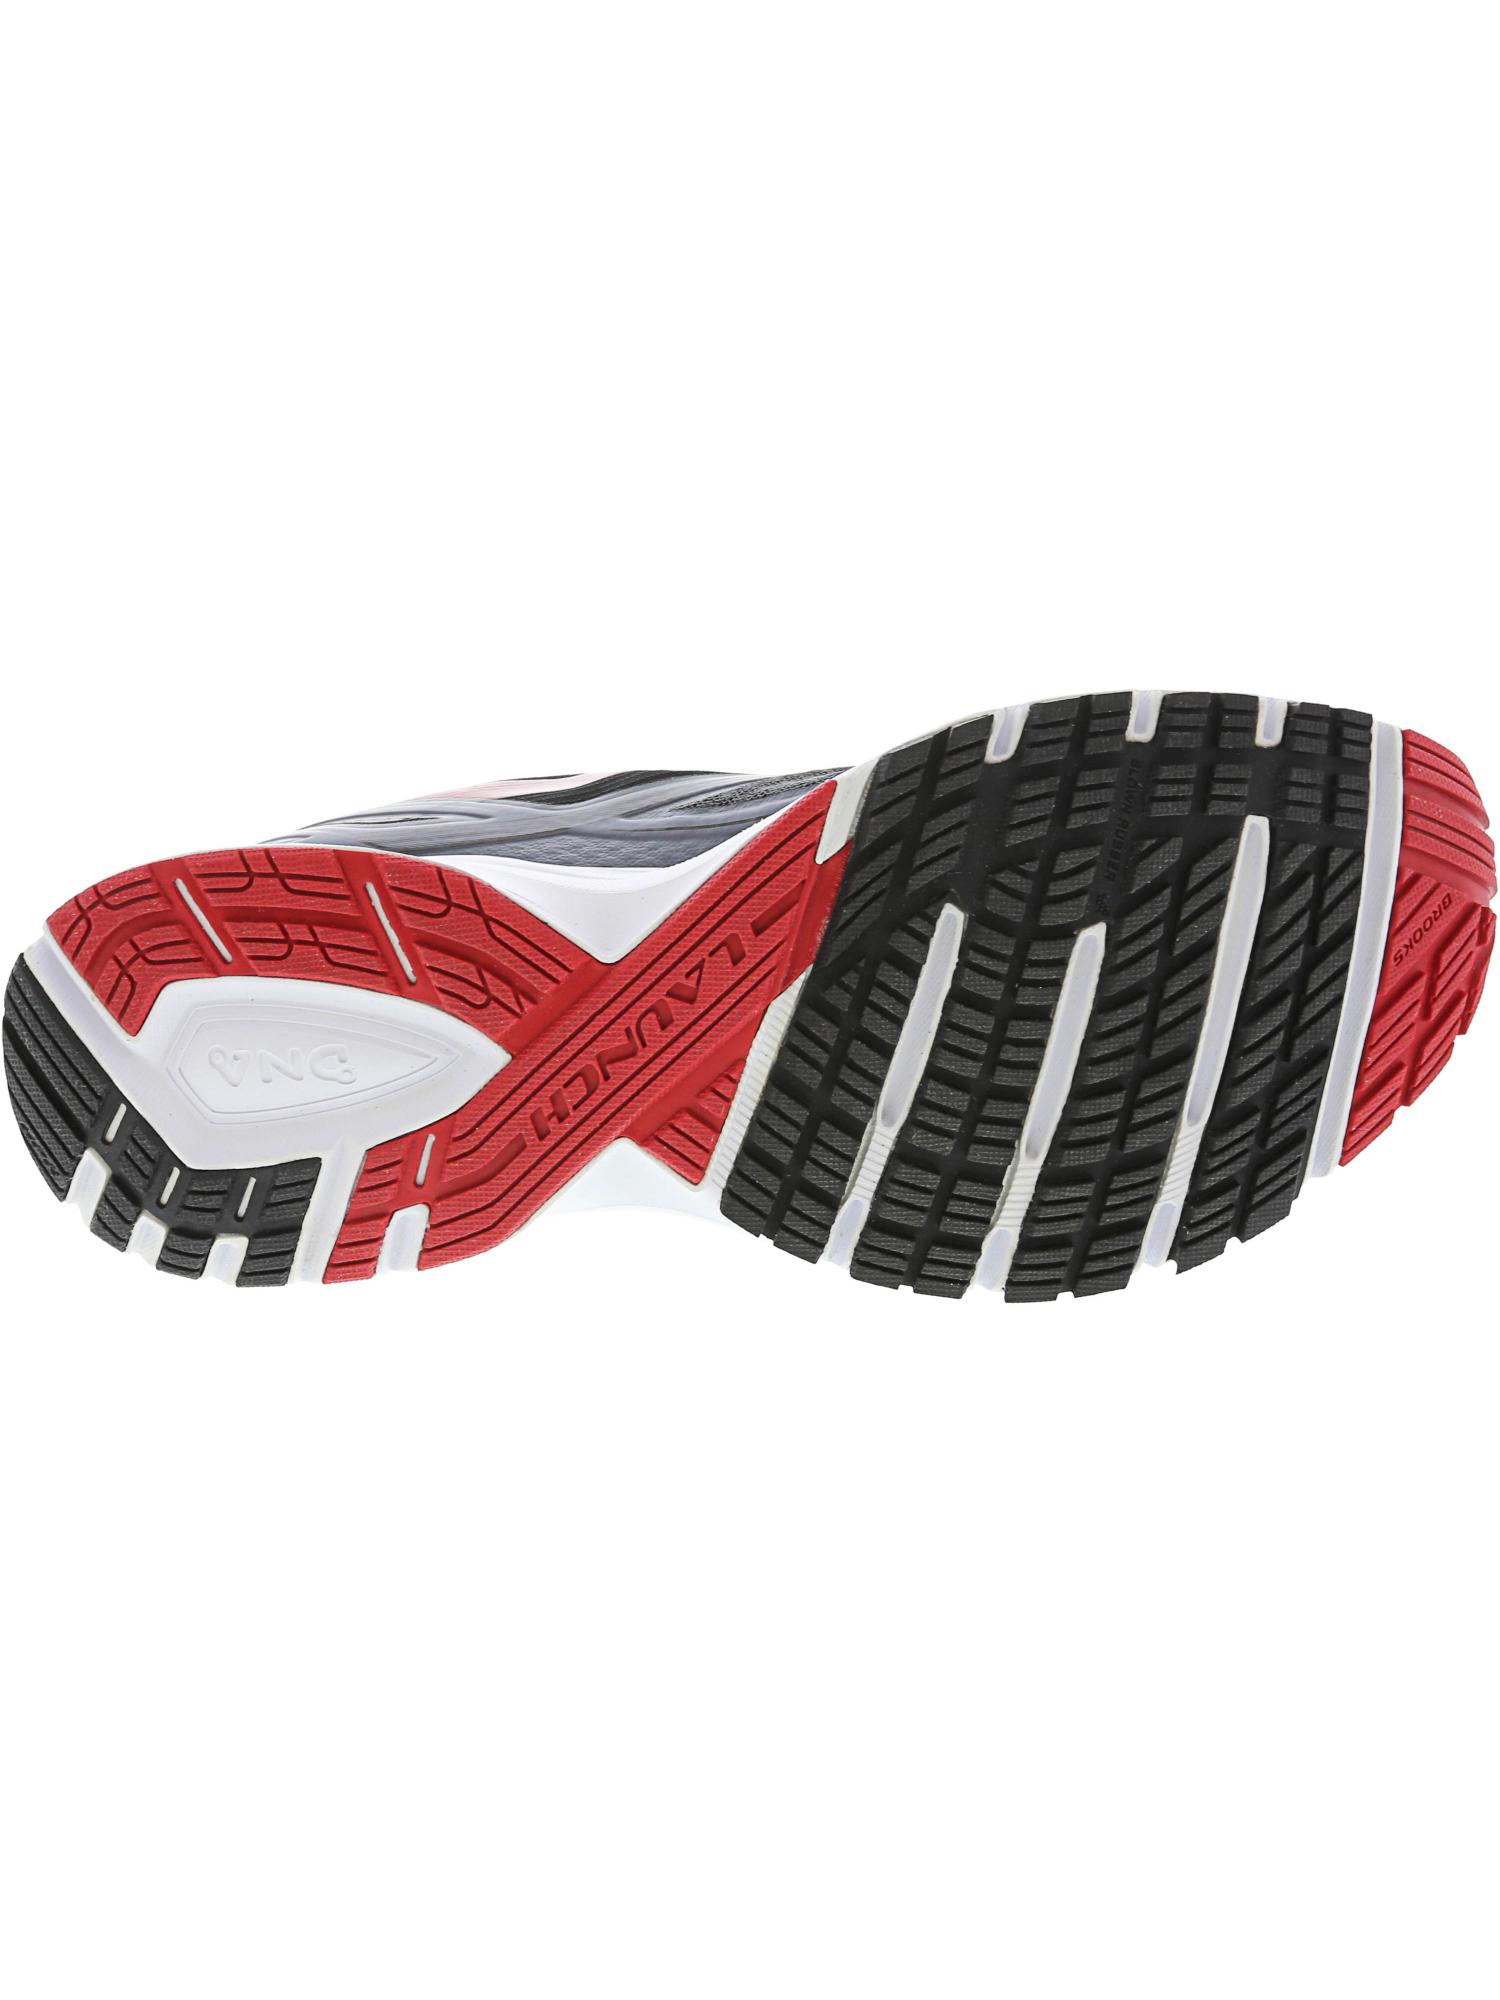 8b343e11b65 Brooks Men s Launch 4 Ankle-High Mesh Running Shoe